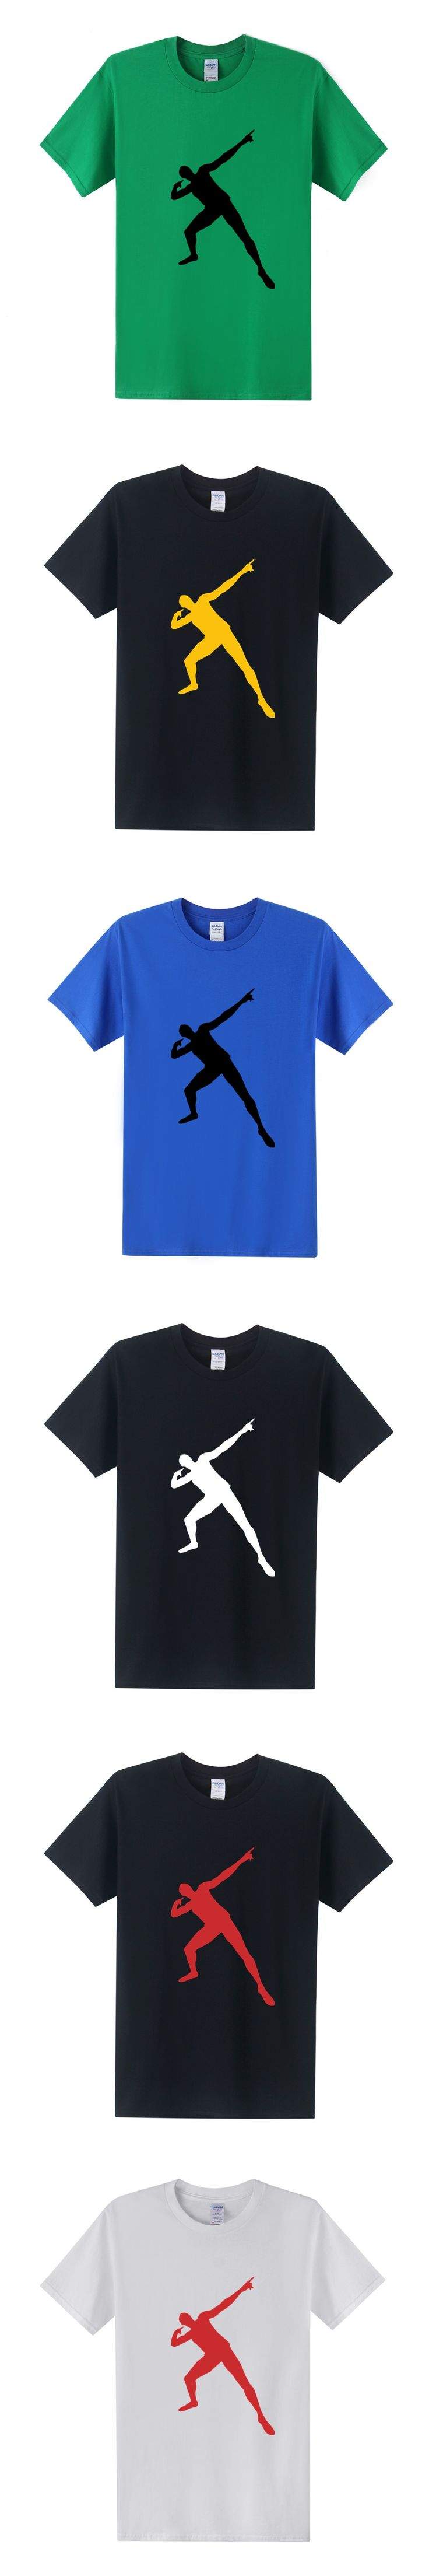 Men Usain Bolt Printed T Shirt Summer Style Fashion 2016 Short Sleeve O Neck Men Tees Shirt  Plus Size XS-3XL OT-225